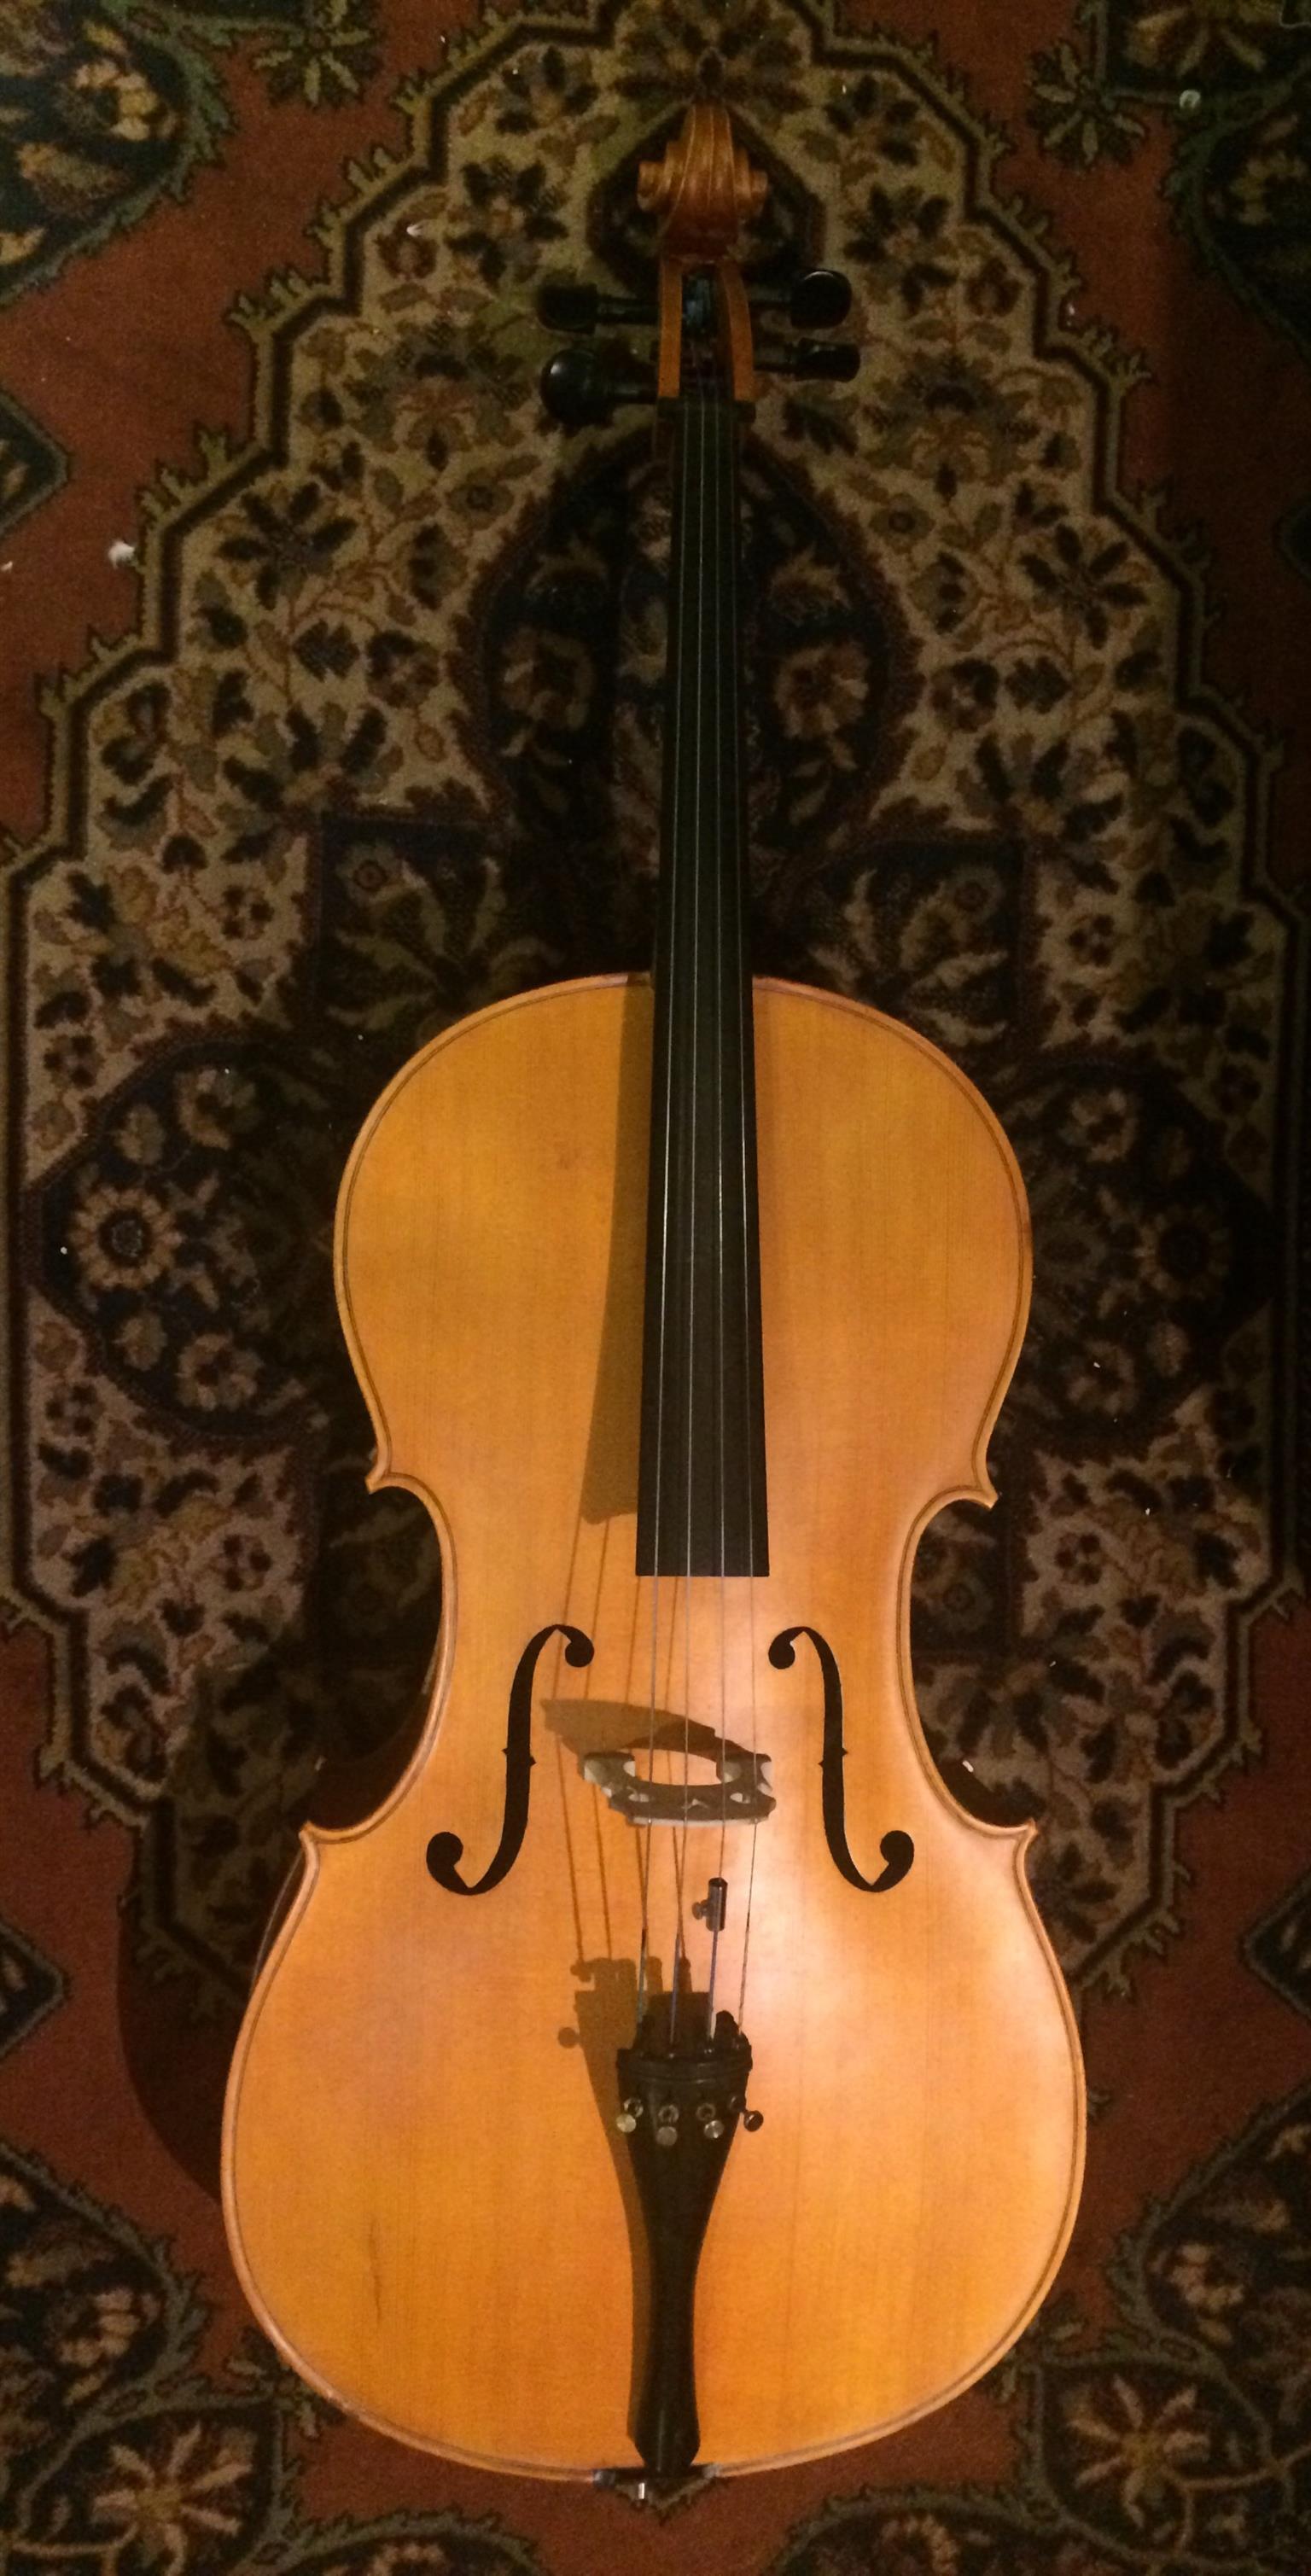 Professionally Handmade Full Size Cello